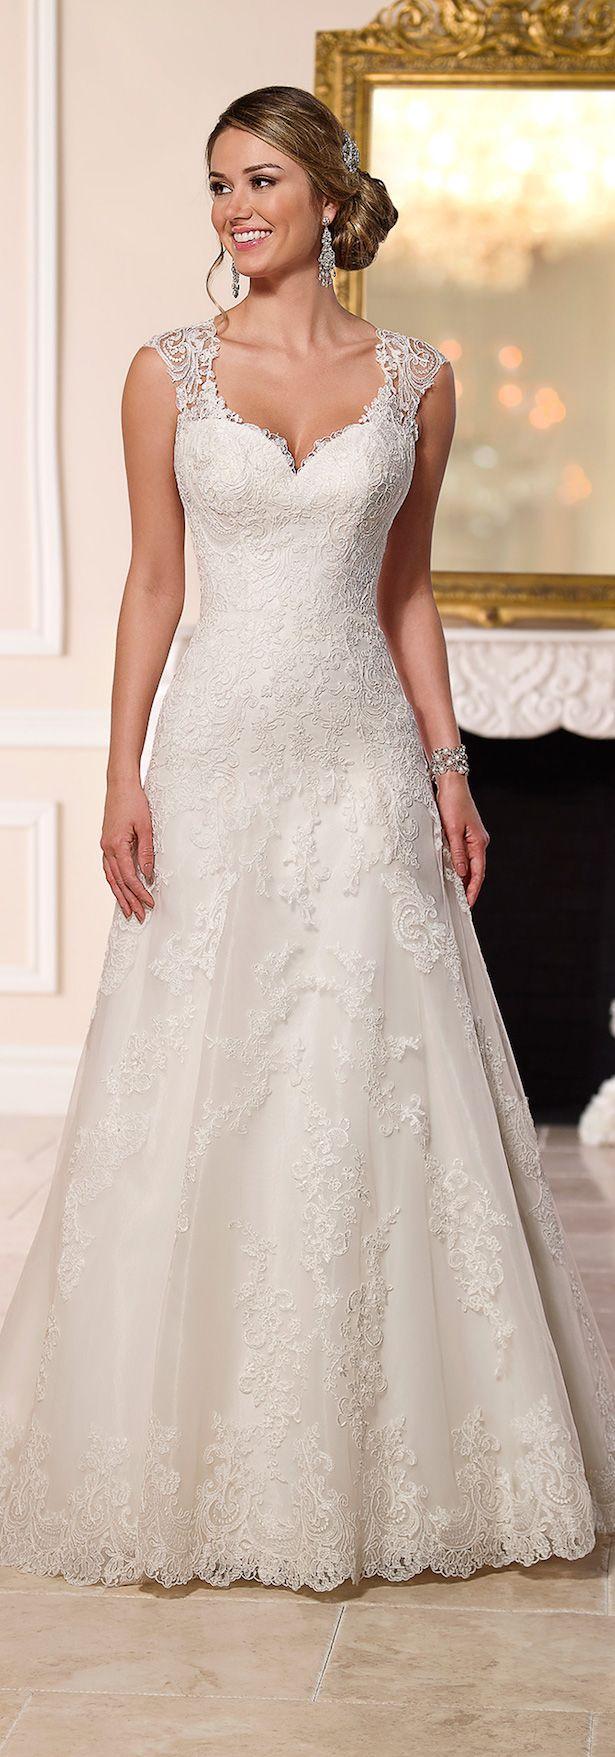 Wedding-Dresses-0716